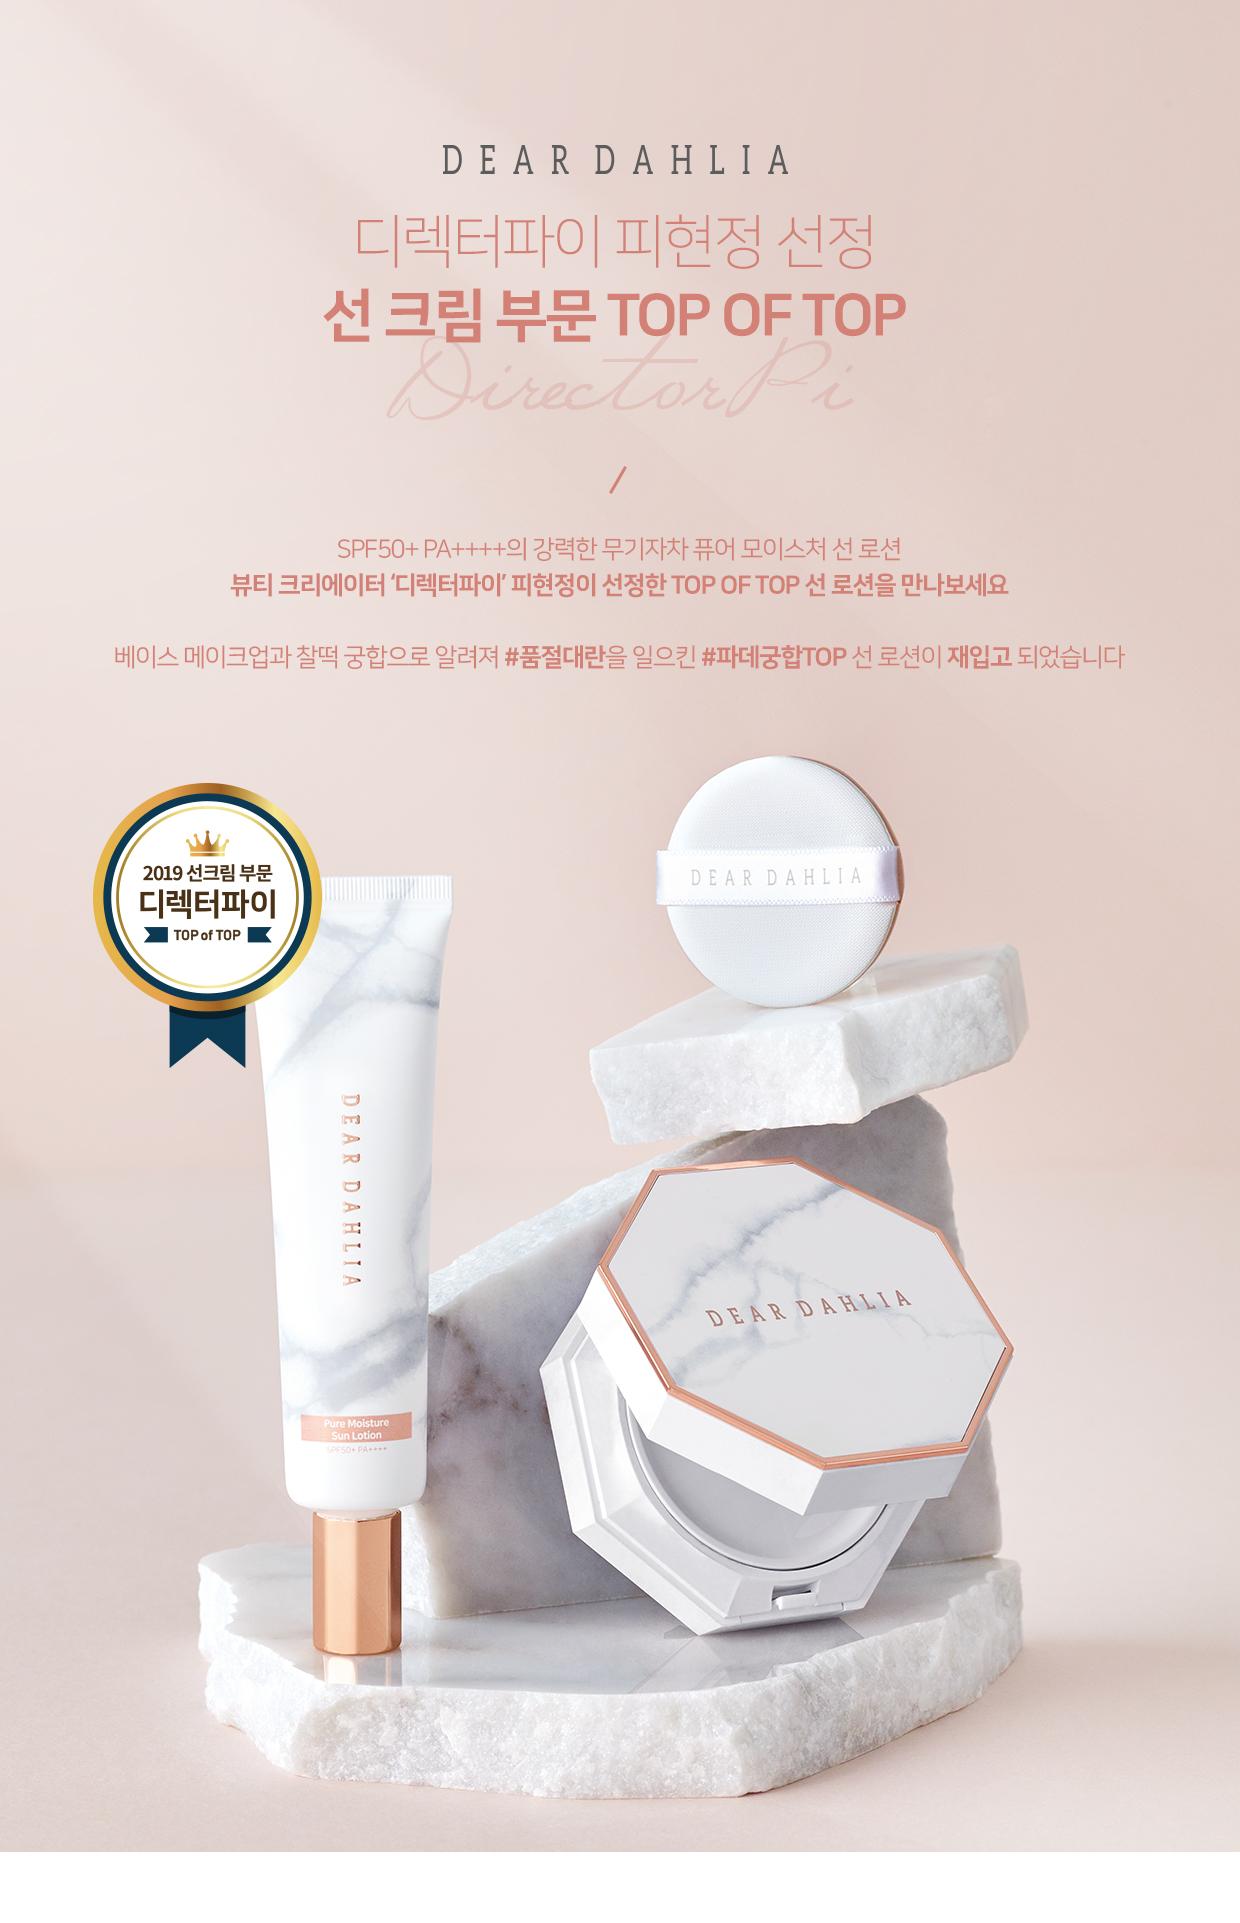 [ShiPAPA] dear dahlia | 純淨保濕防曬乳 | 韓國直送🇰🇷 | 香港 澳門